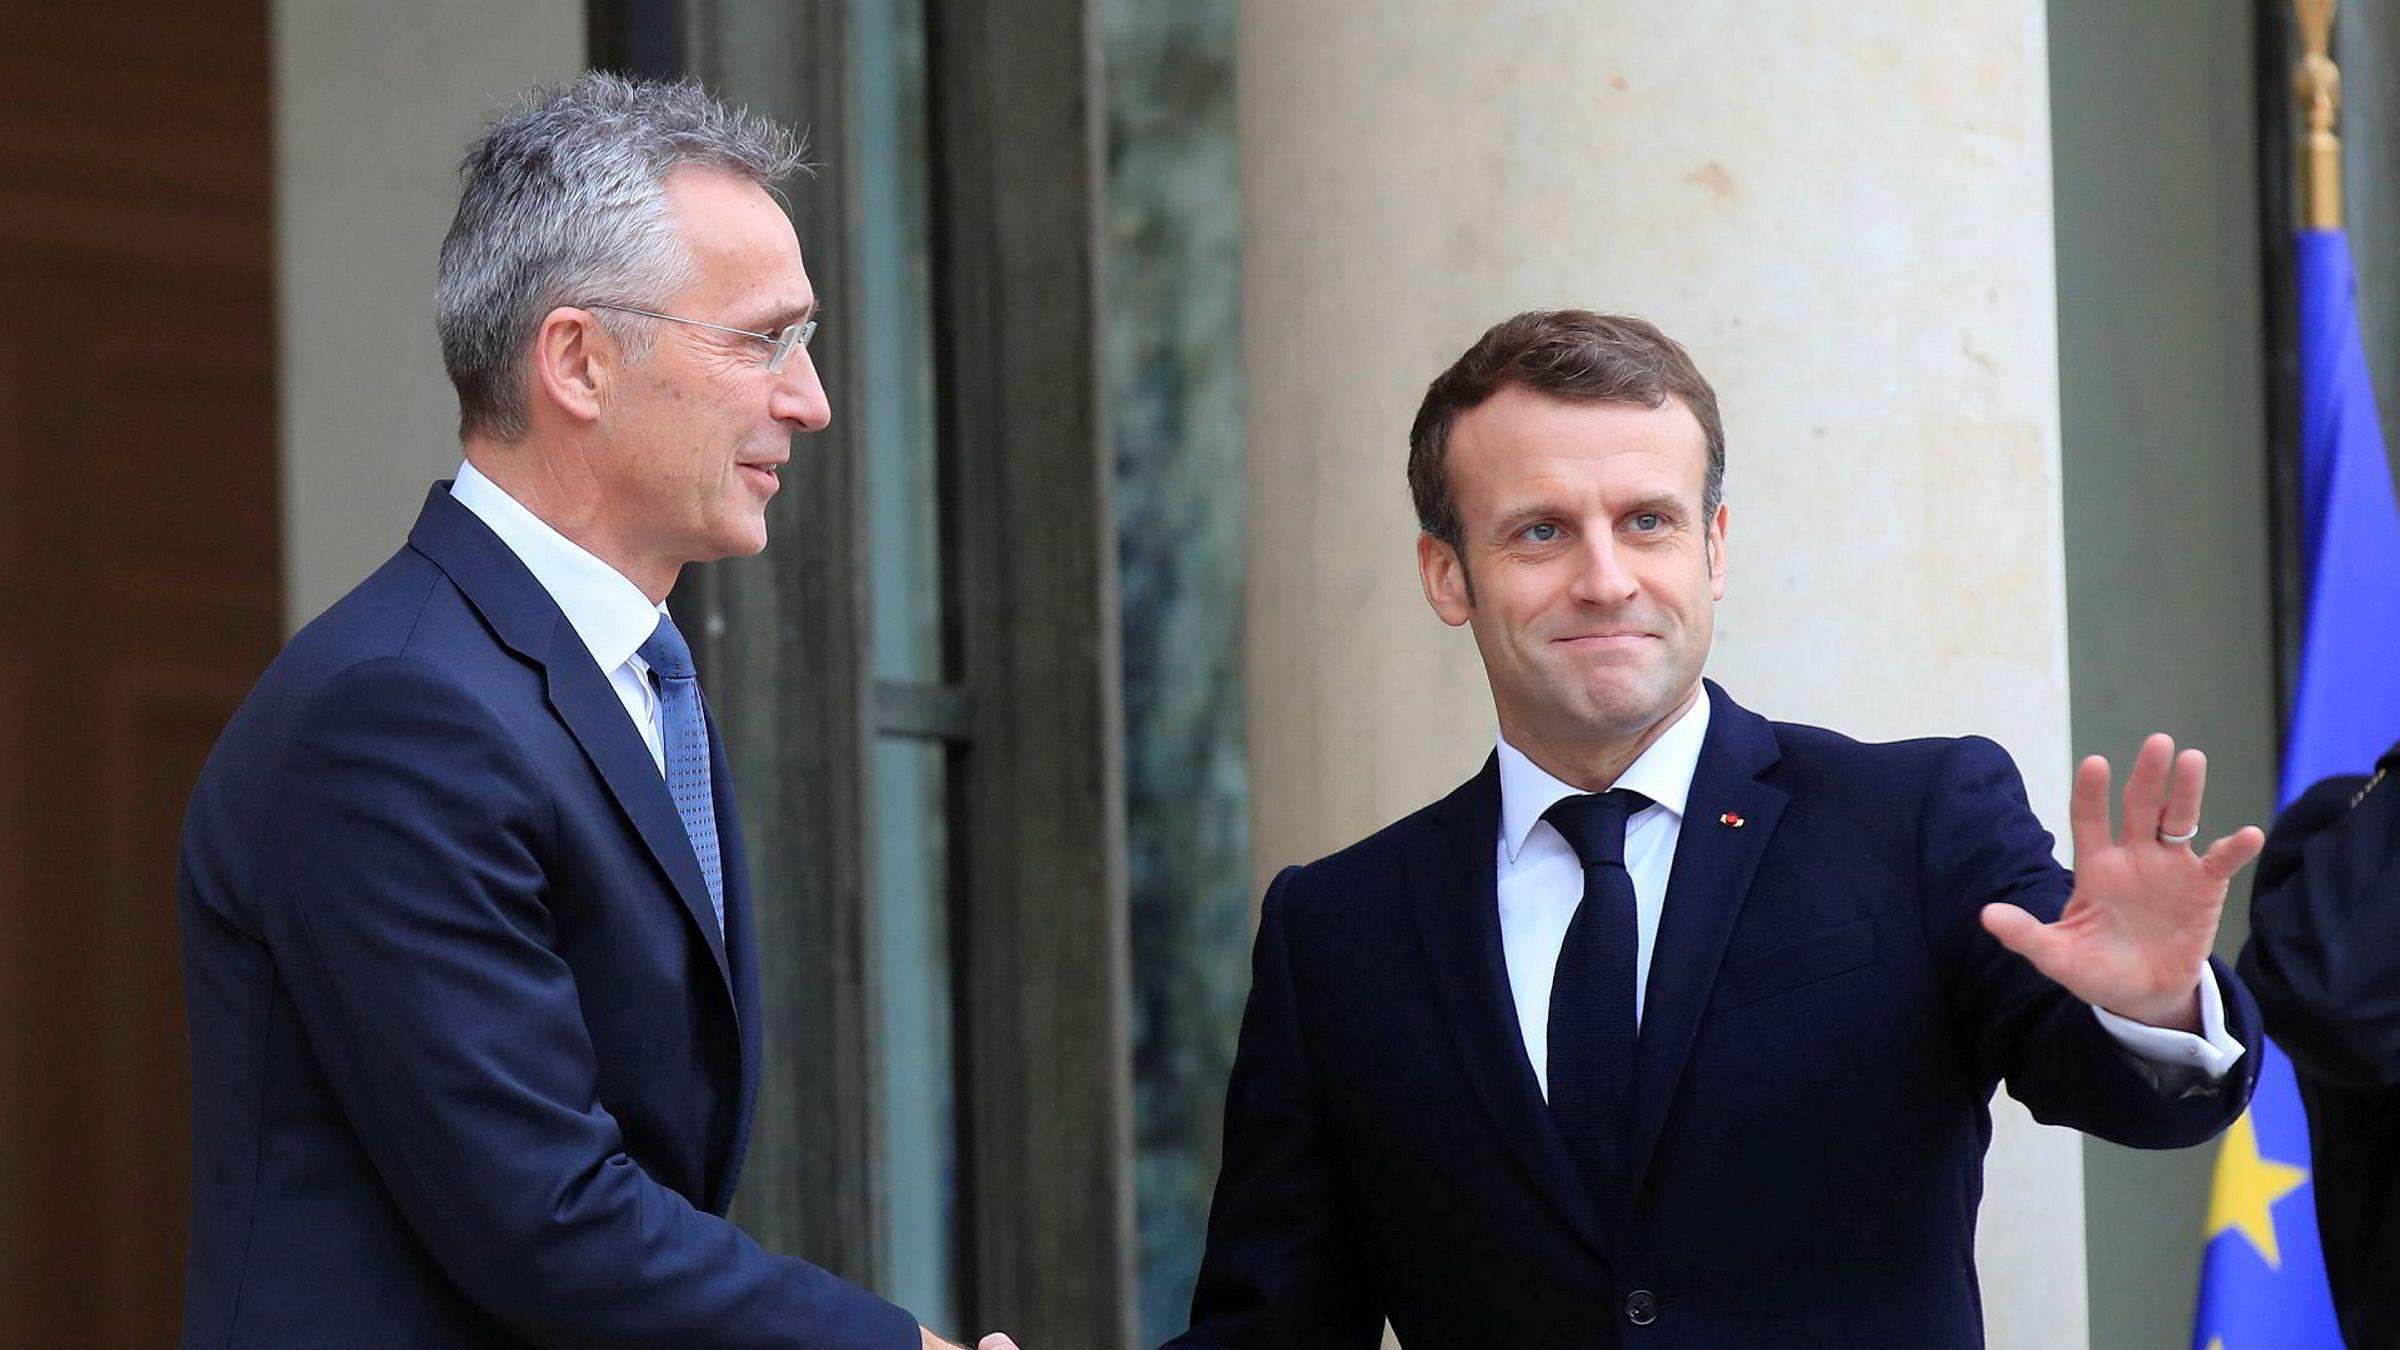 Natos generalsekretær Jens Stoltenberg besøkte torsdag Frankrikes president Emmanuel Macron ved Élyséepalasset i Paris.